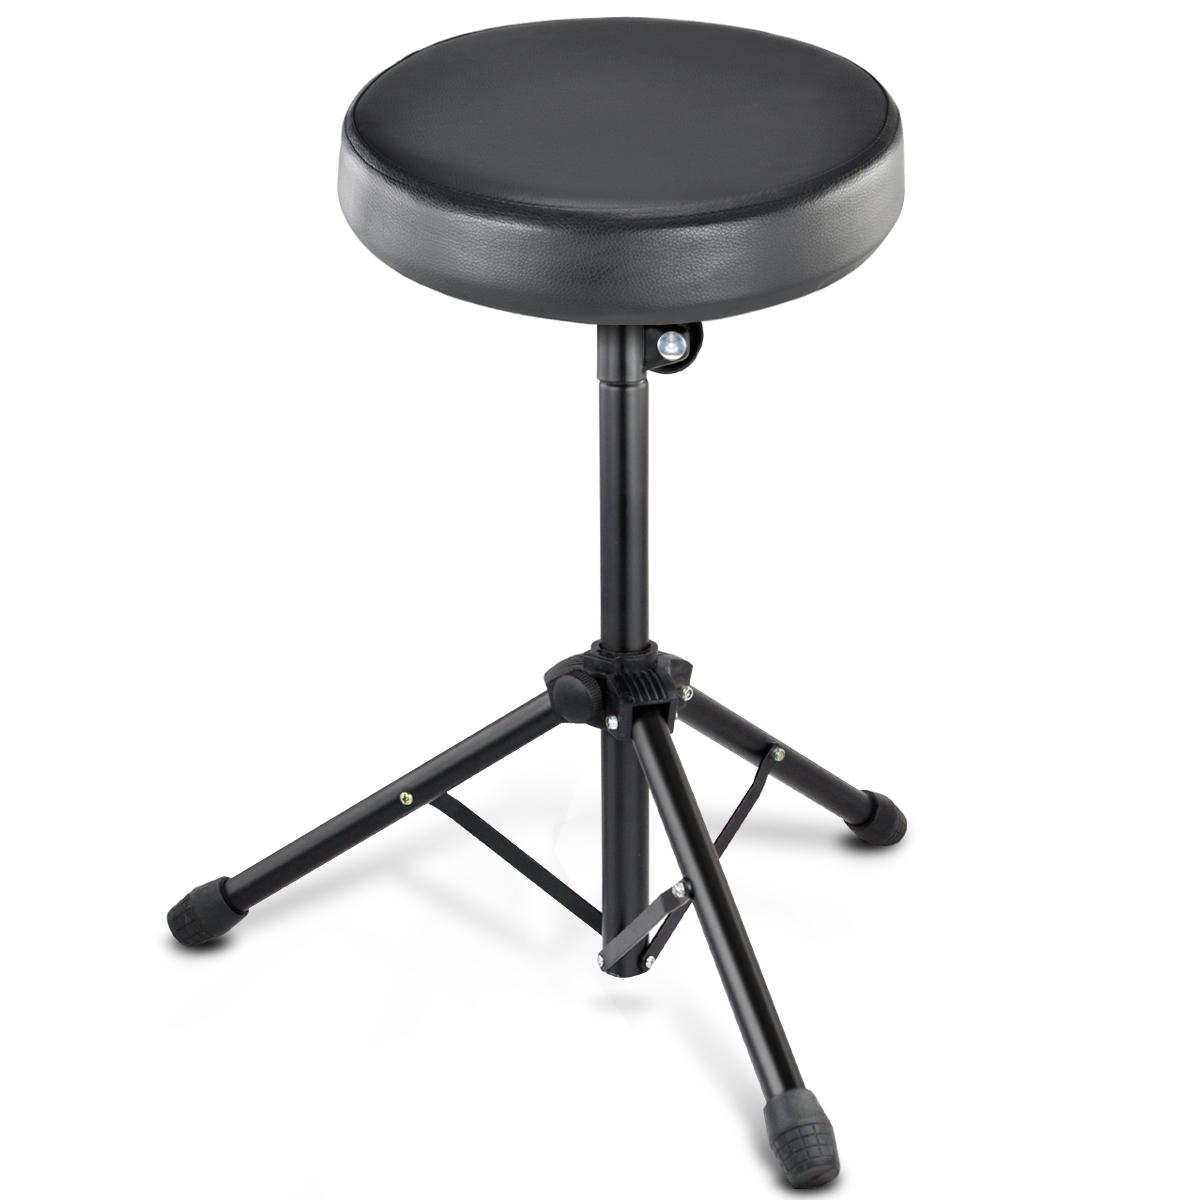 folding chair guitar chords covers uk ltd birmingham quality music keyboard drum stool rock band